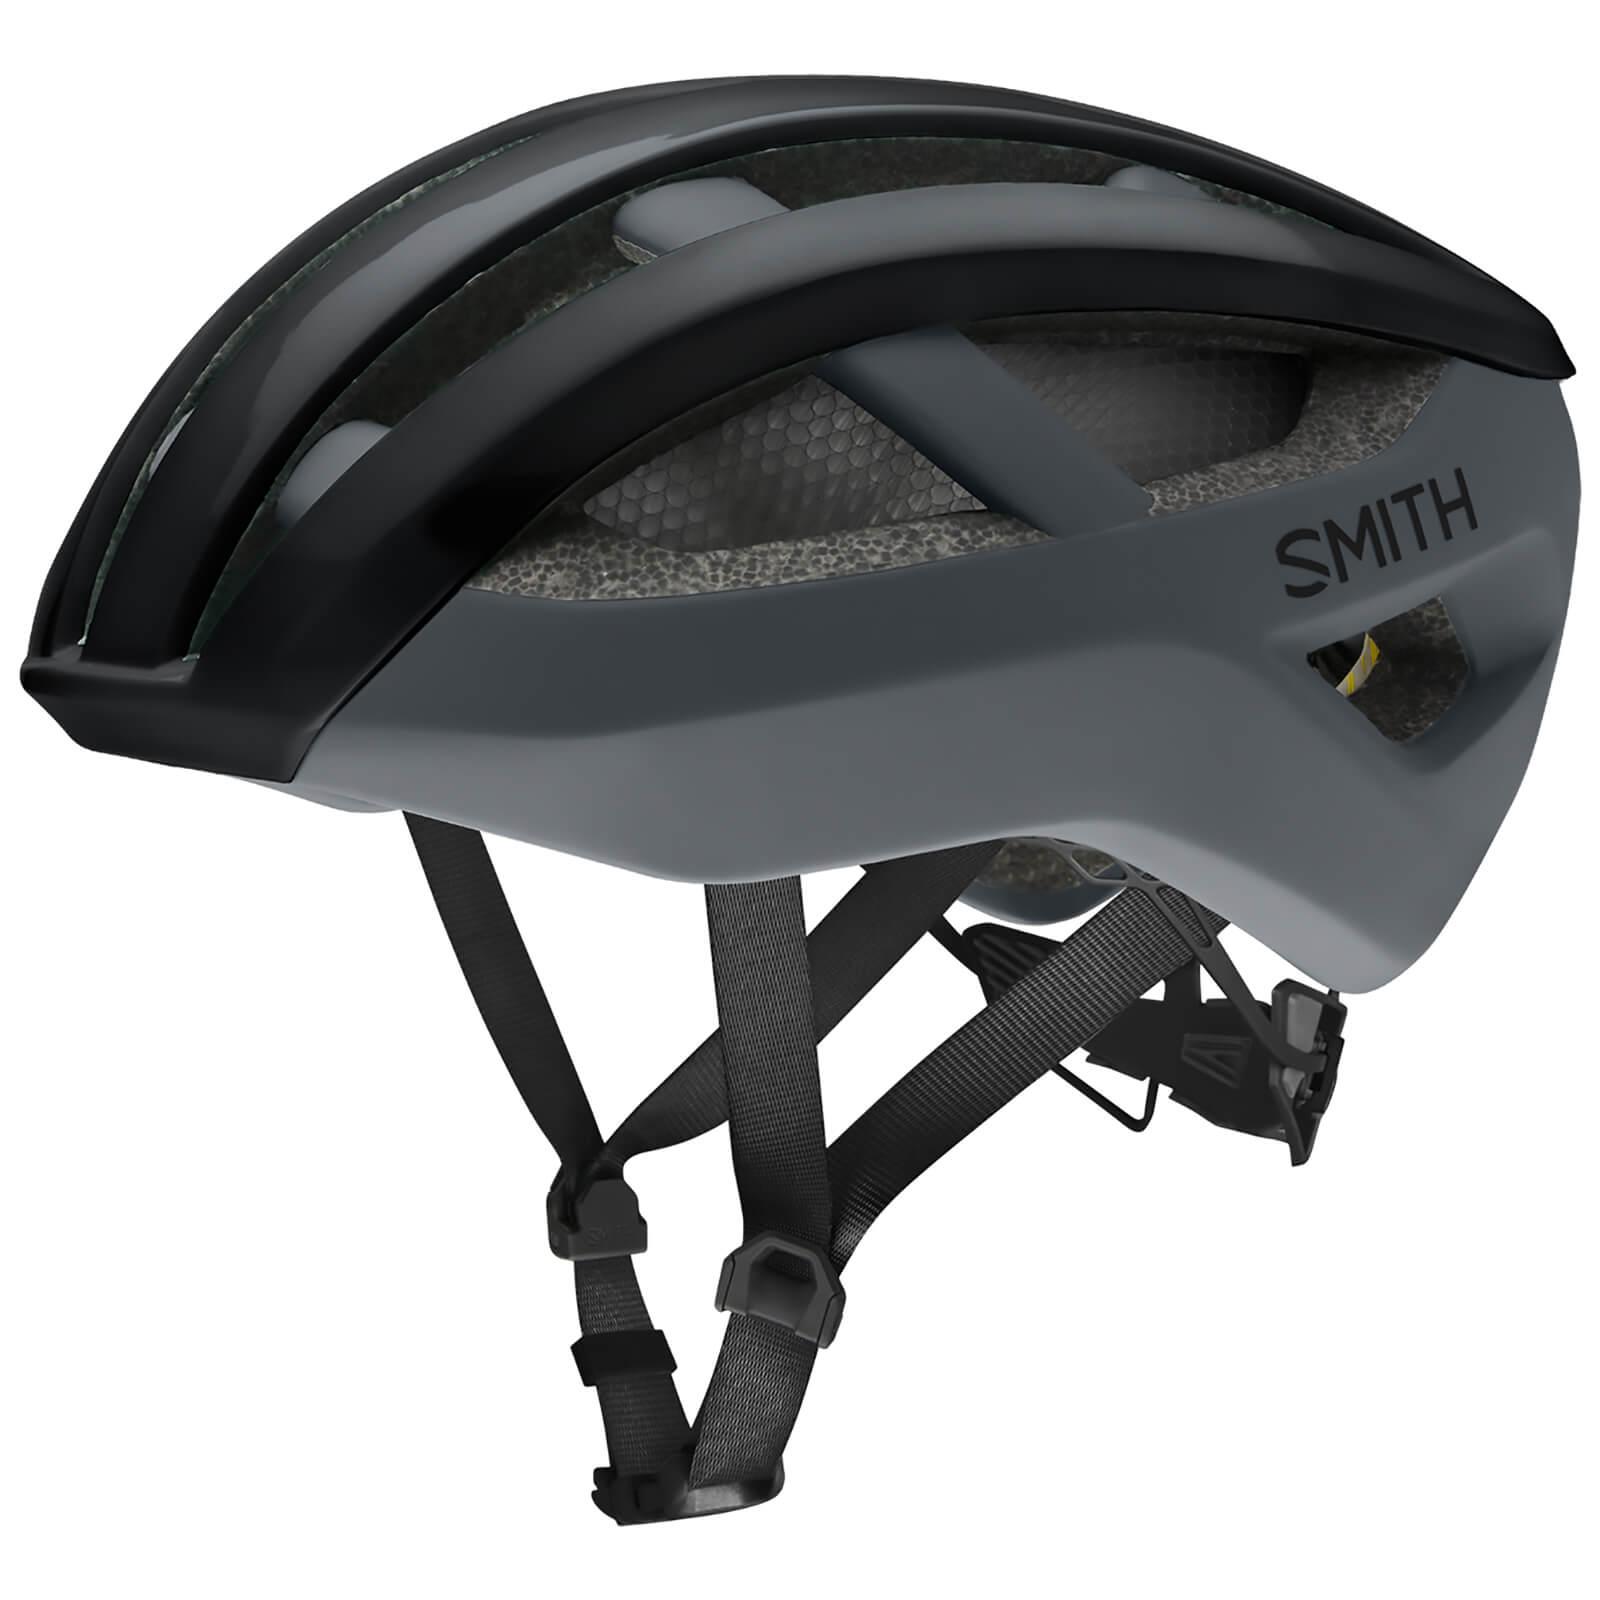 Smith Network MIPS Road Helmet - Medium - Black - Matte Cement; unisex